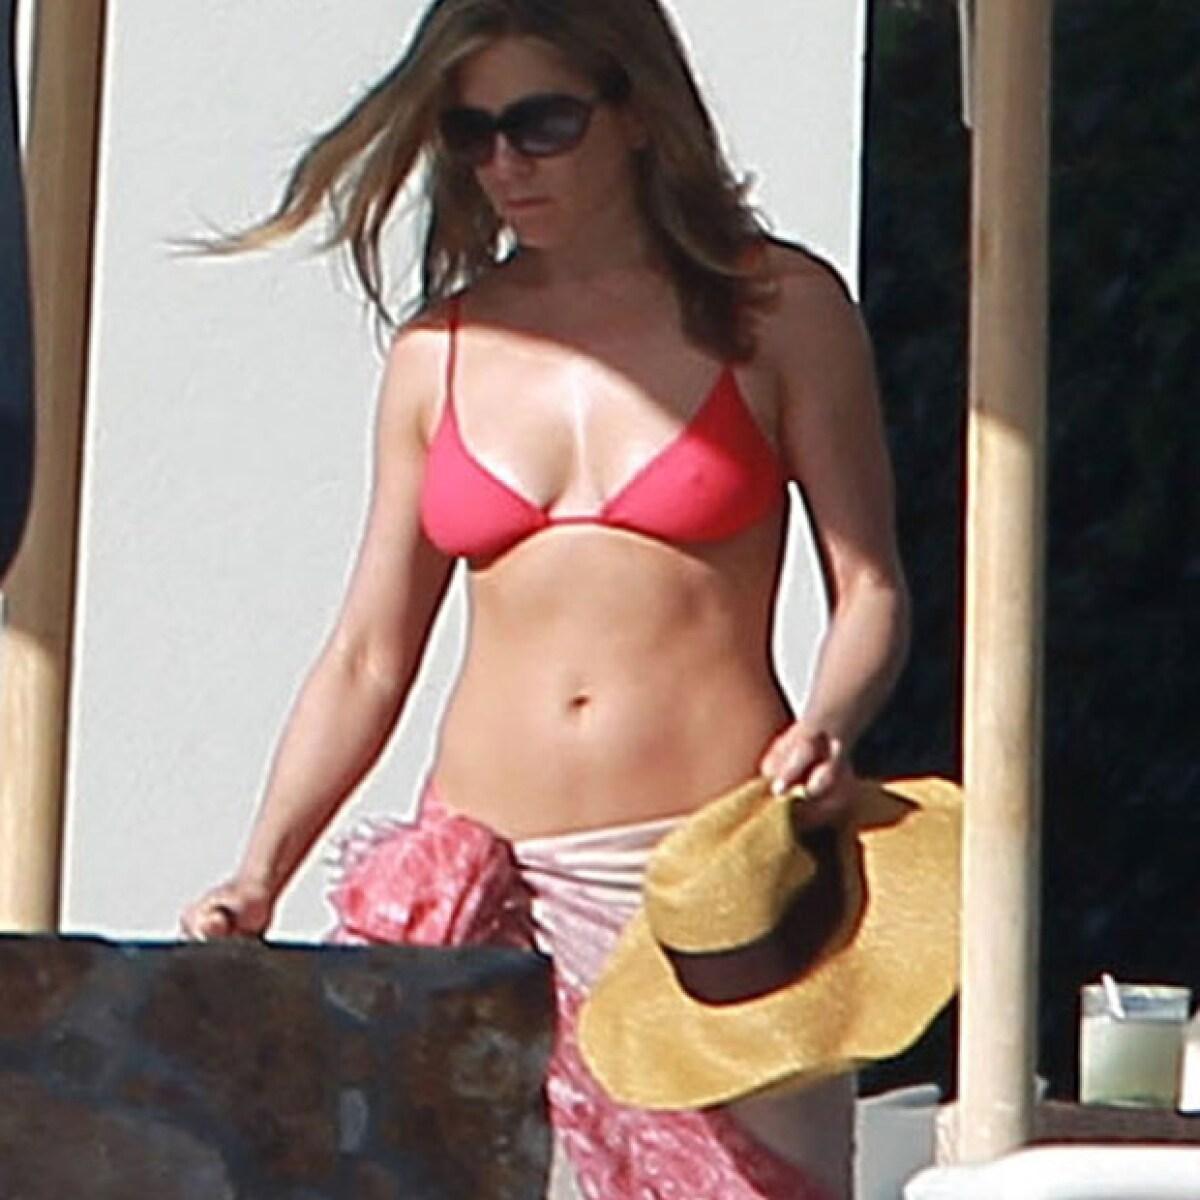 A sus 40 lucen espectaculares en bikini ¿quiénes son?